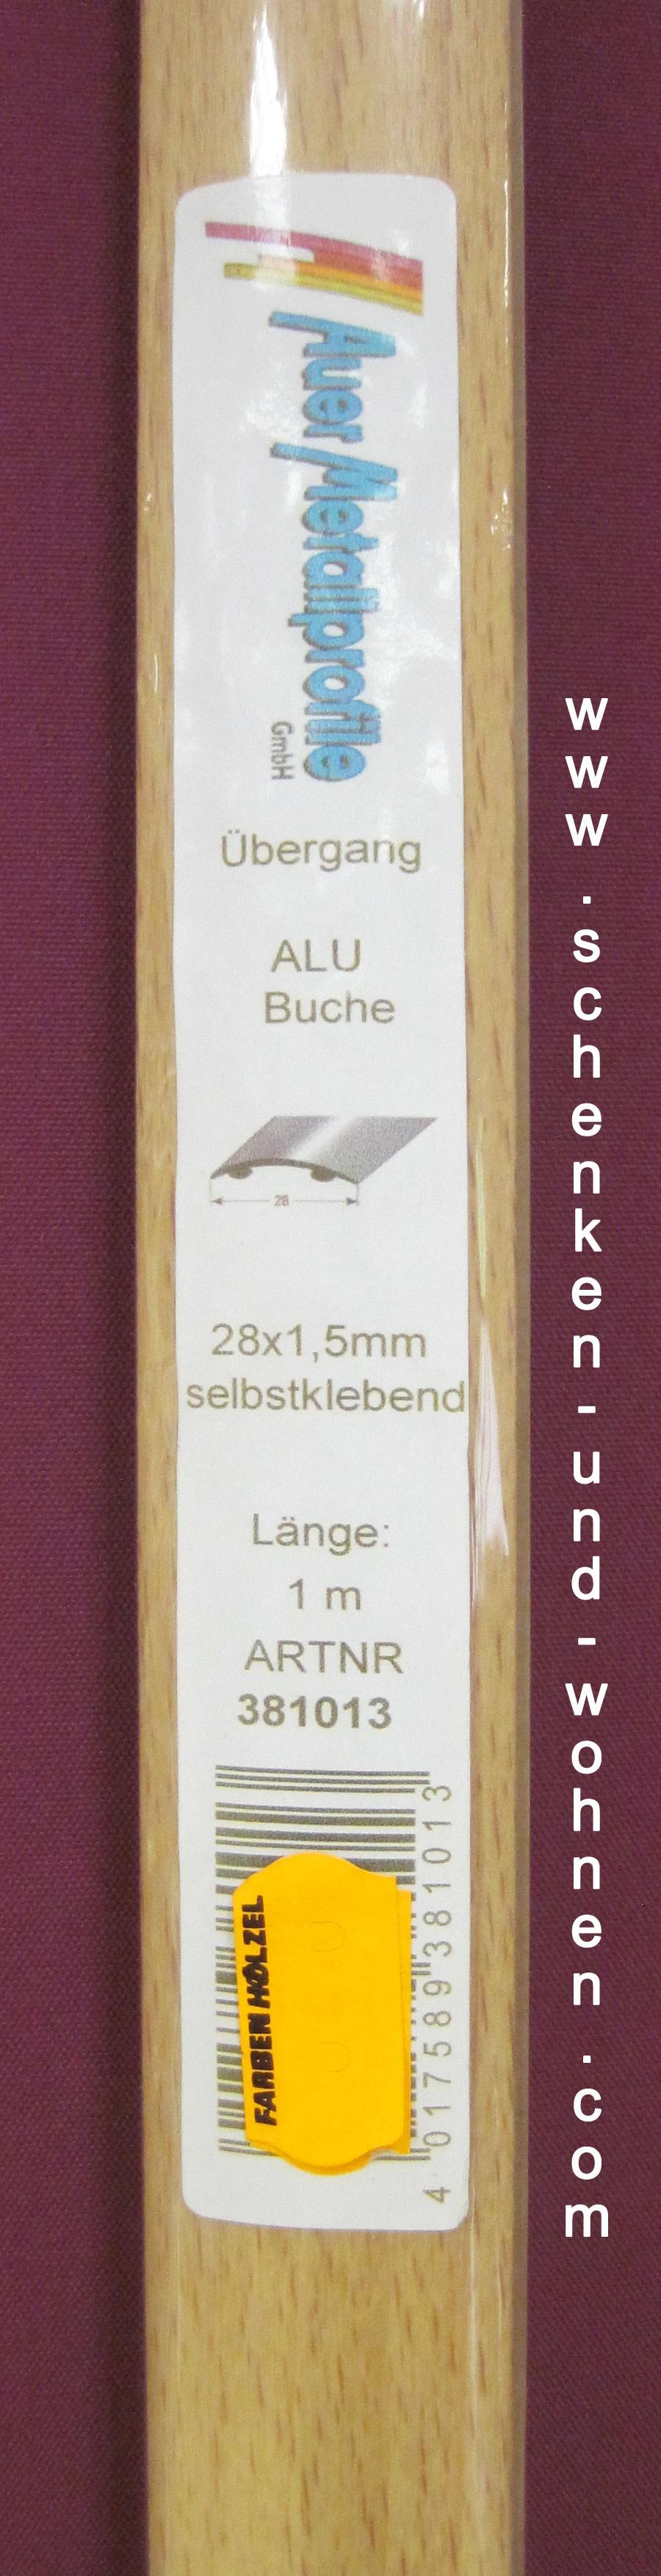 Übergangsprofil 28x1,5 mm 1,0 m Buche selbstklebend